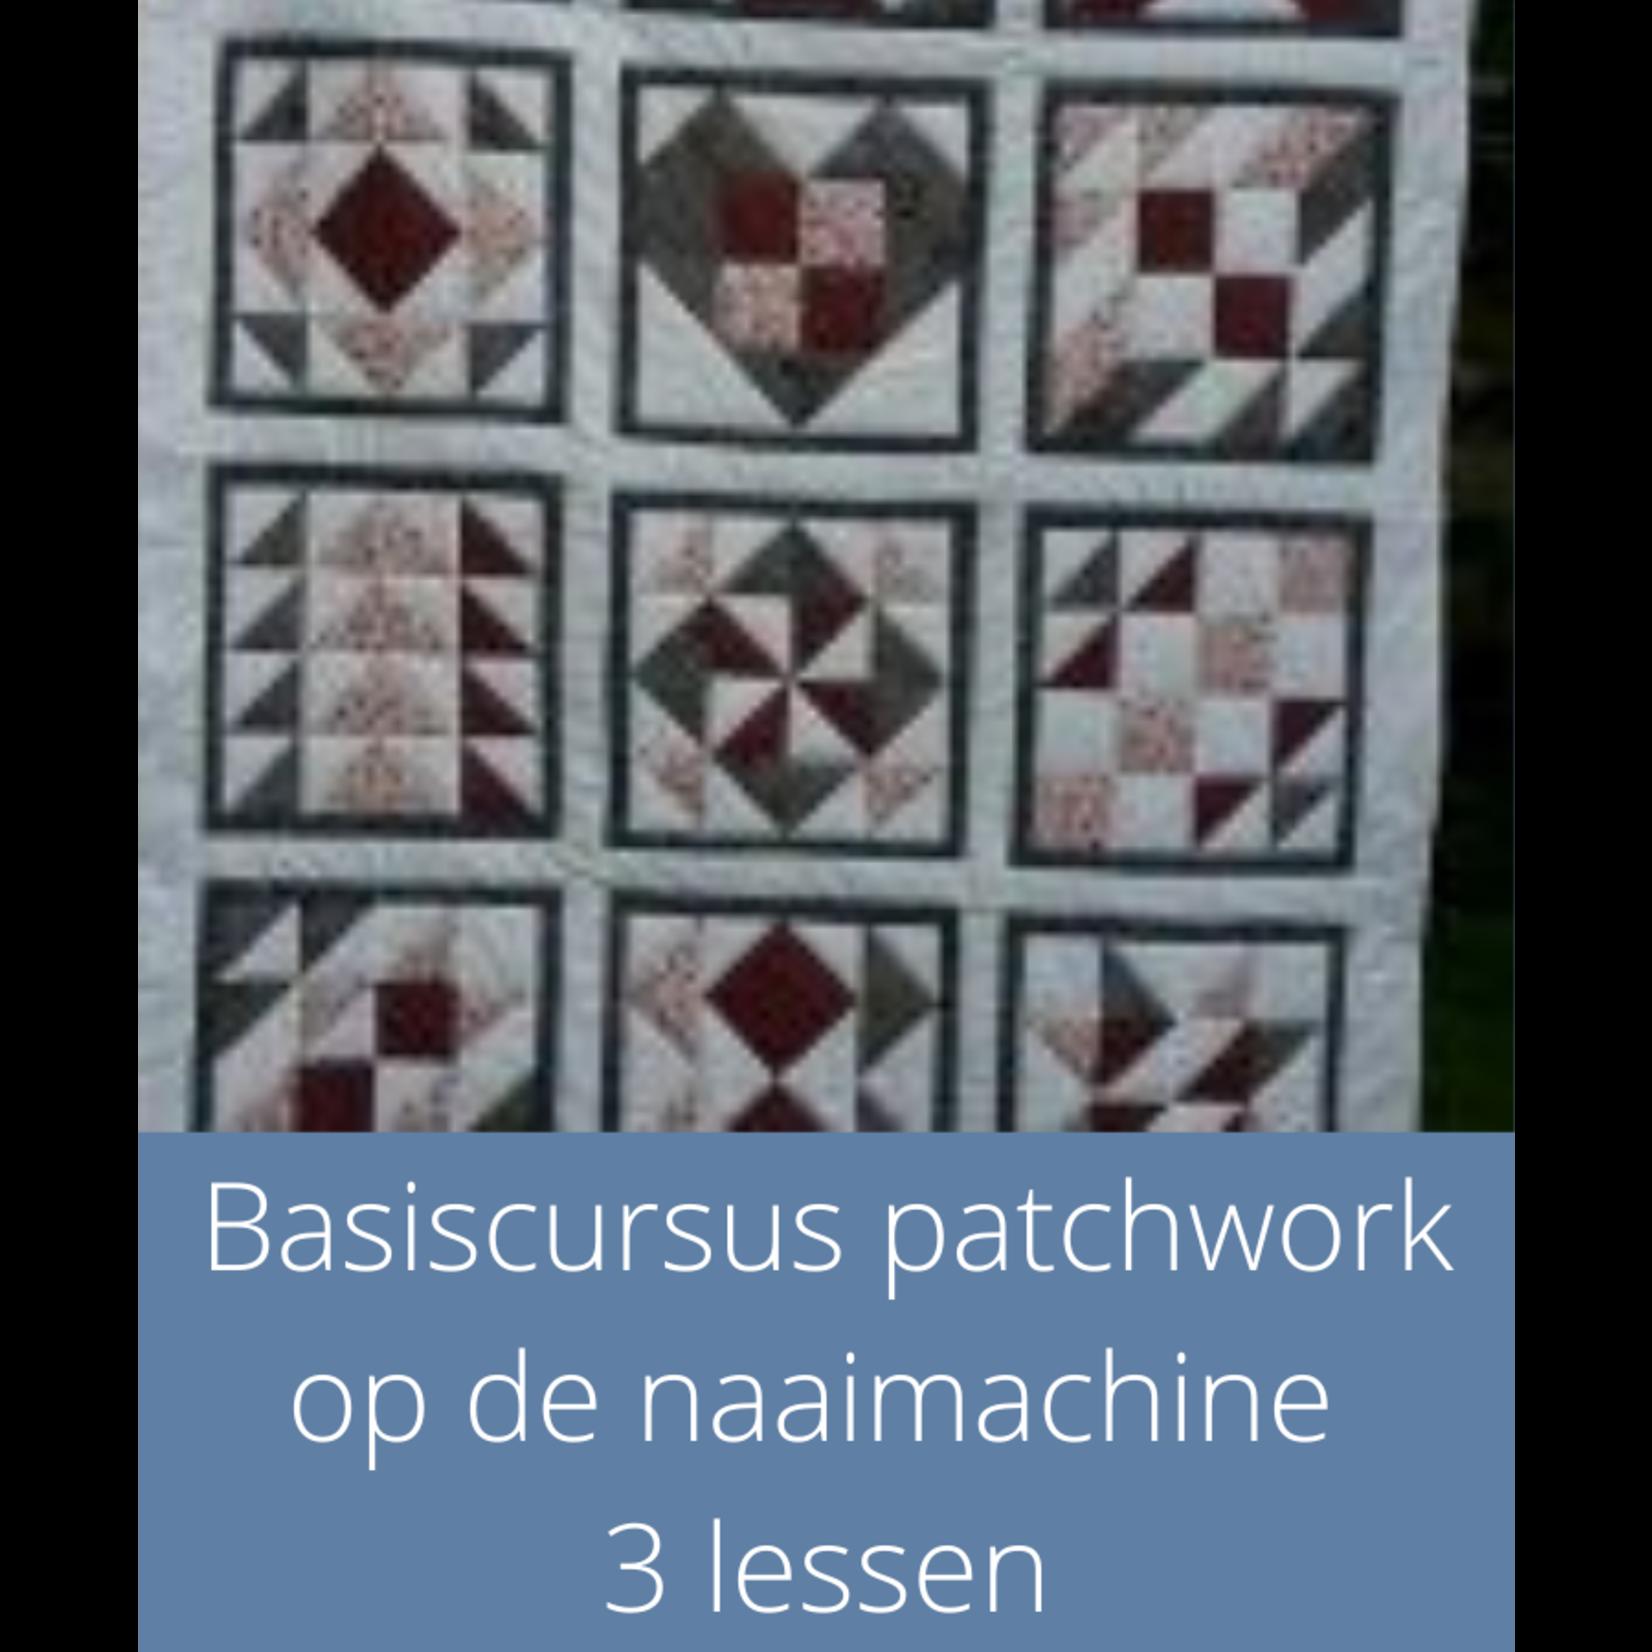 Cursus -Basiscursus patchwork op de naaimachine|3 lessen start 21 sept